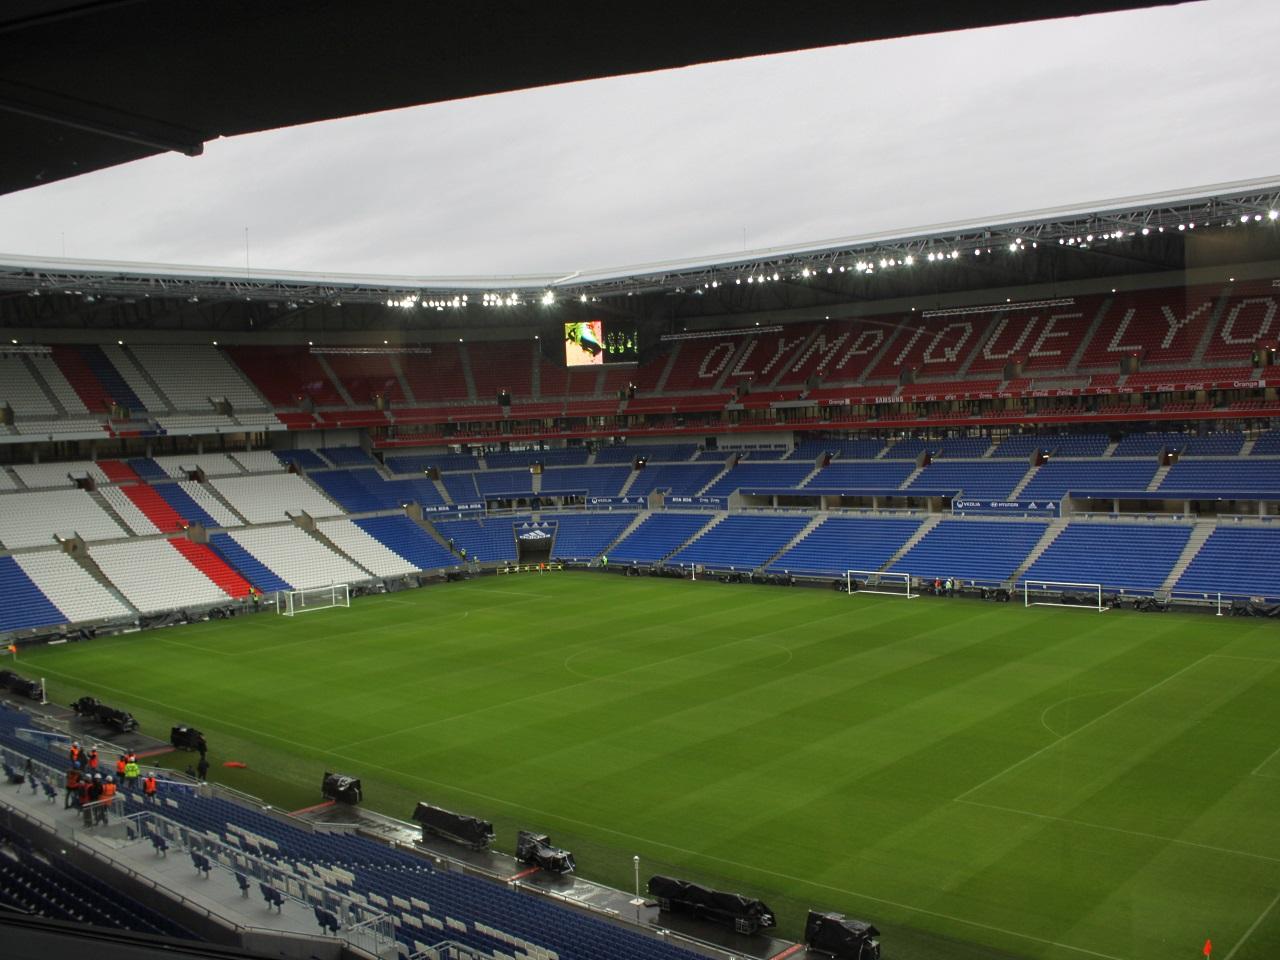 Garcia pas fan des huis clos — Lyon